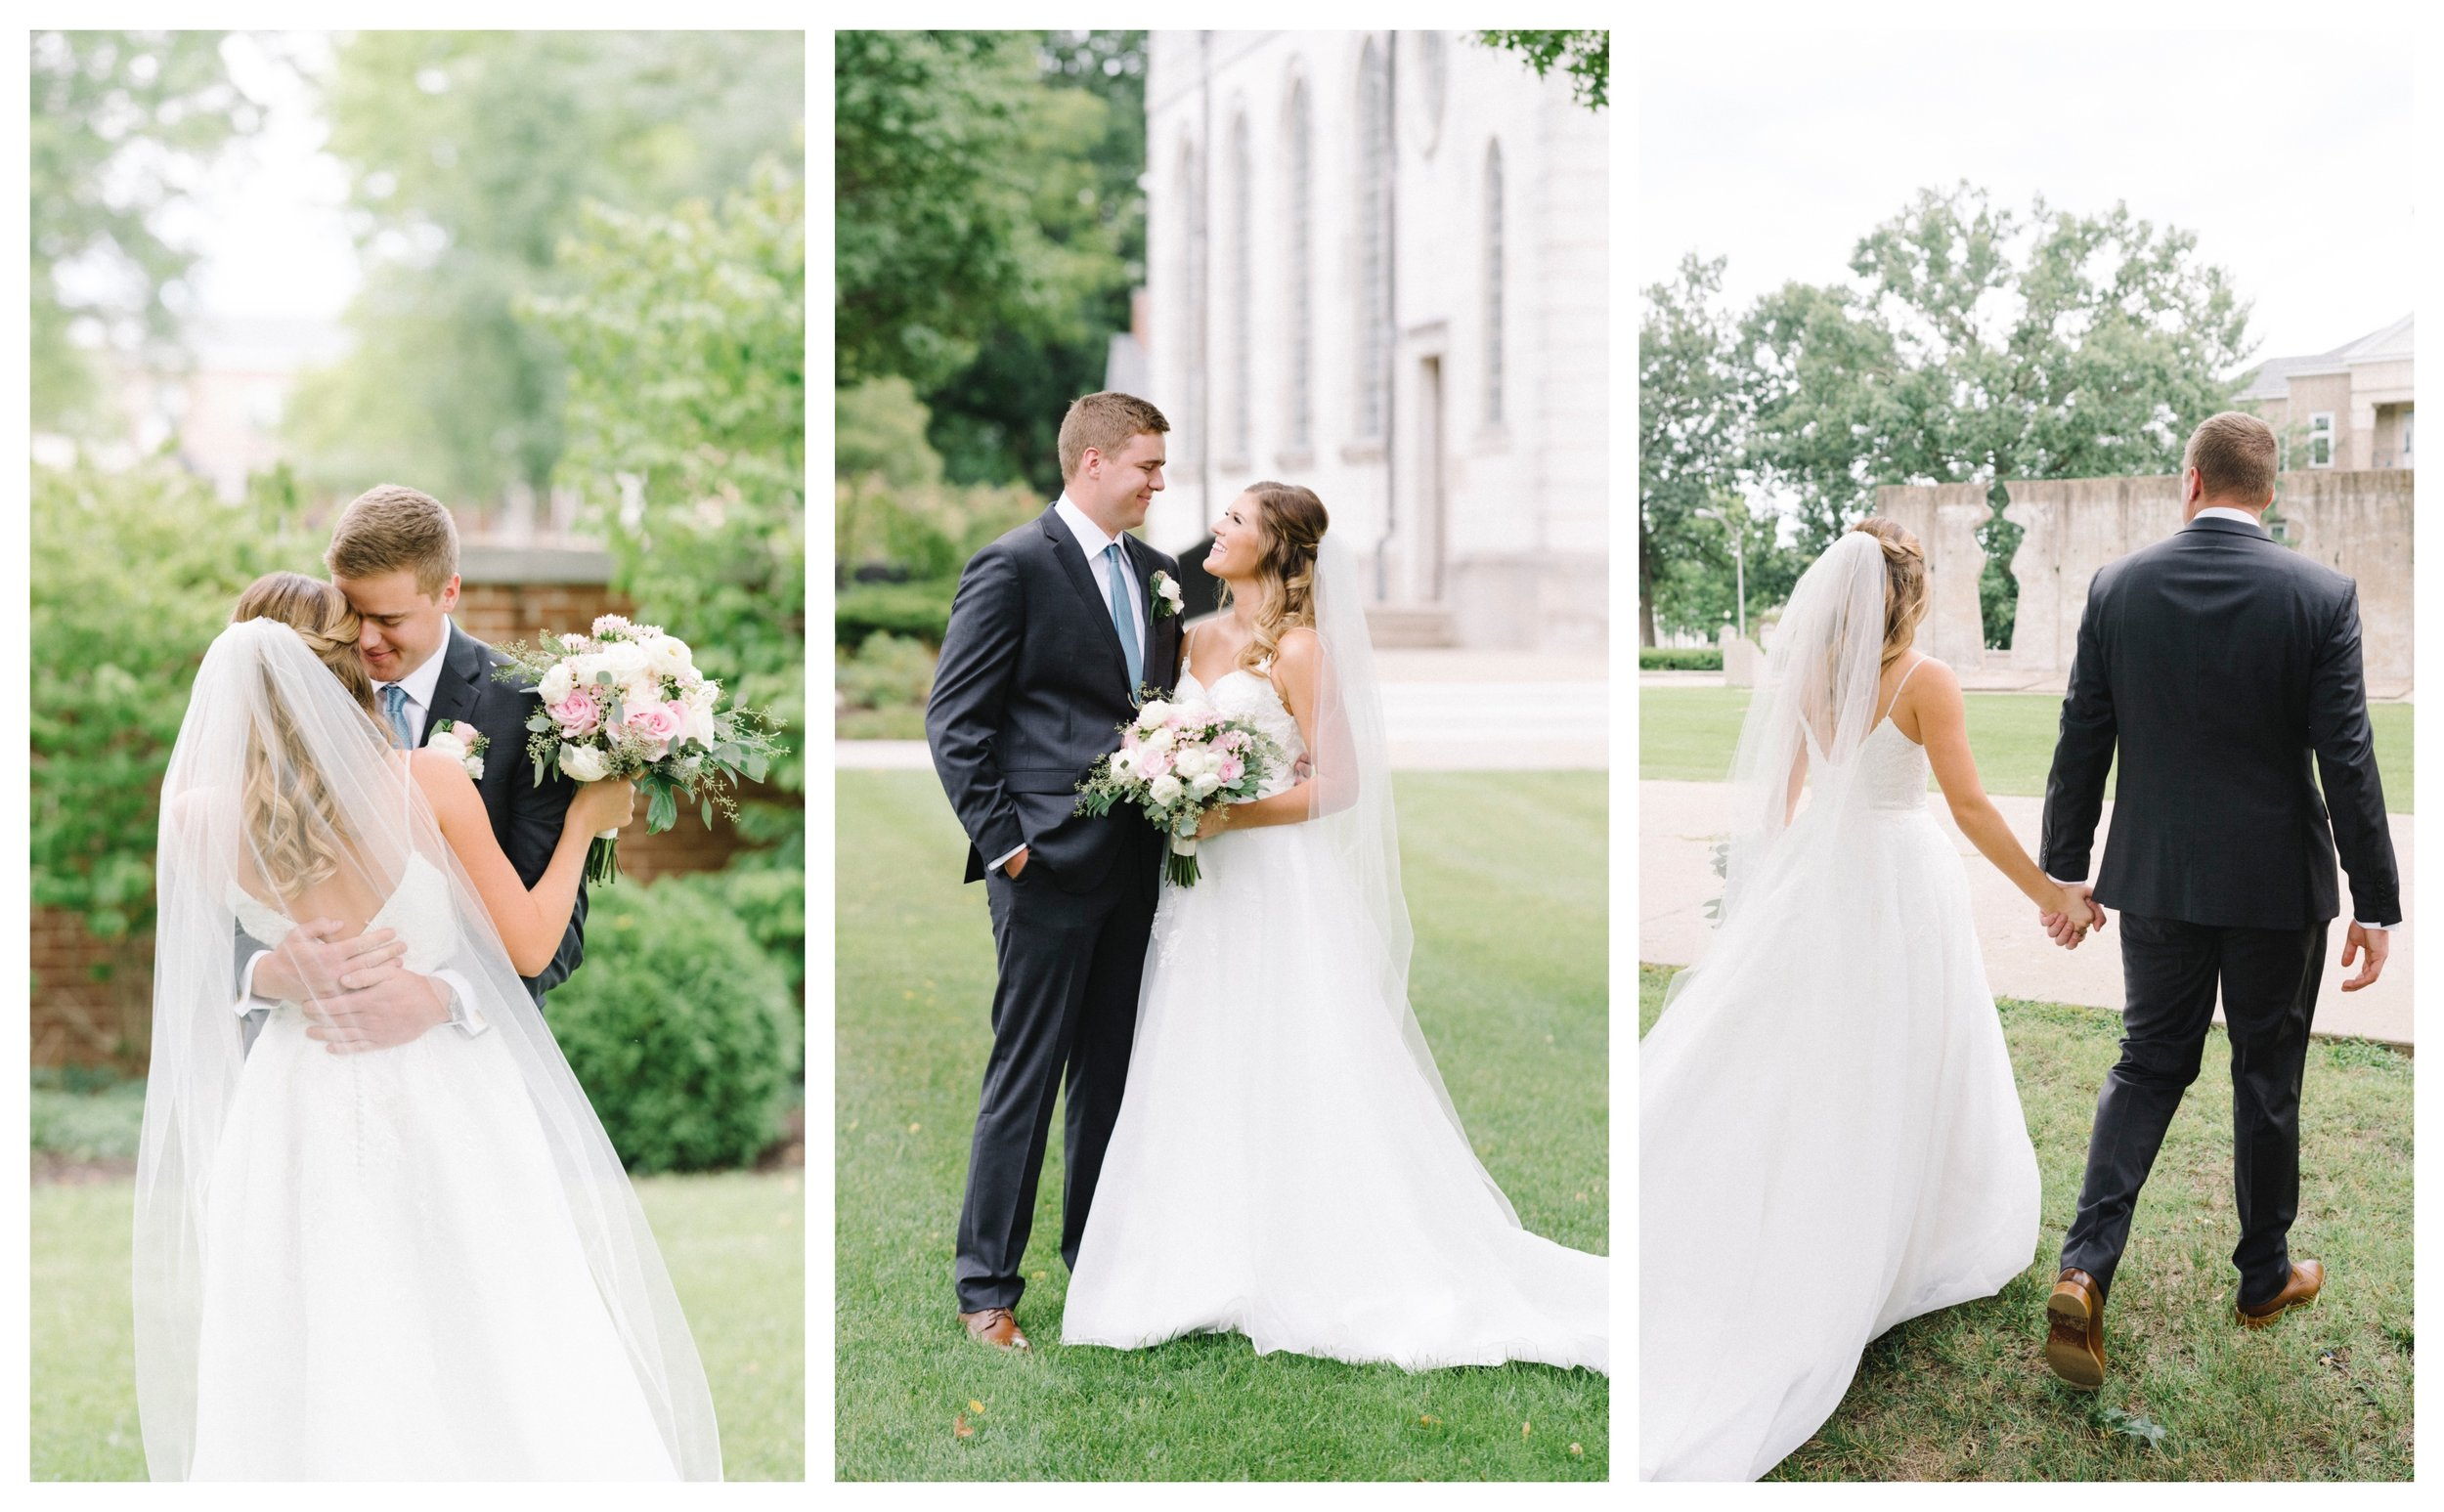 KansasCity_WeddingDress12